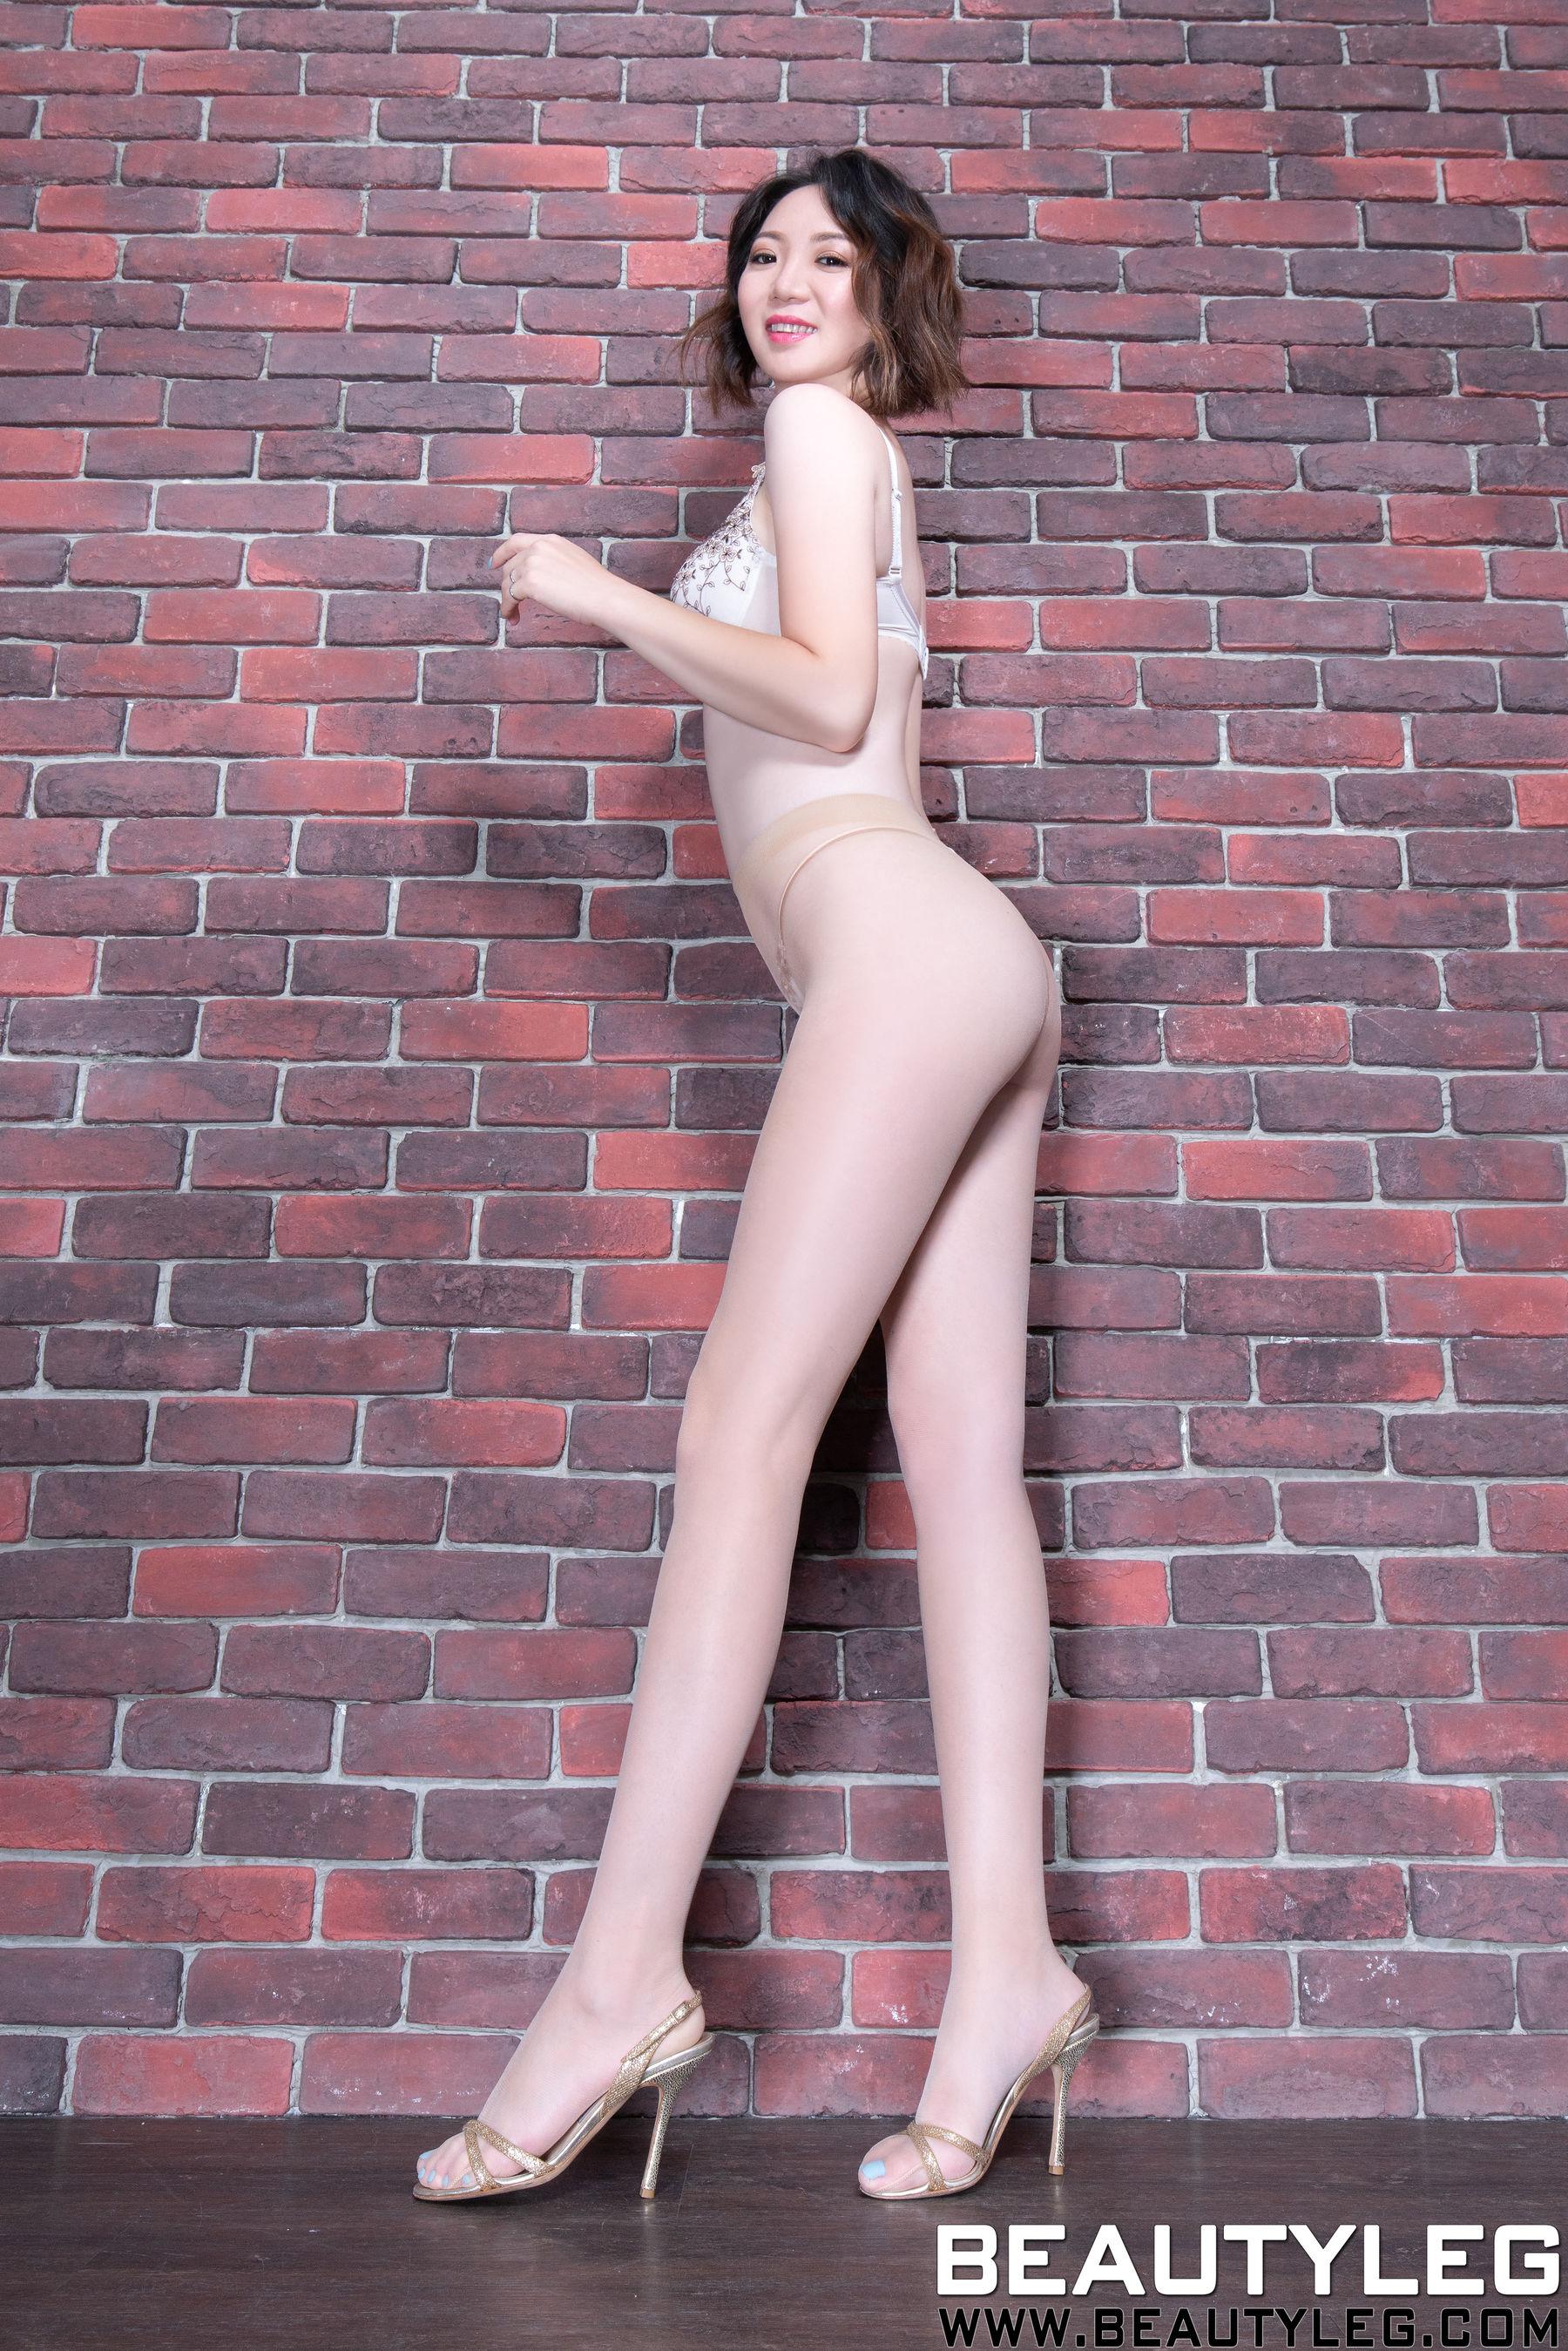 VOL.48 [Beautyleg]丝袜美腿内衣美女长腿美女:腿模Clear(Beautyleg Clear)超高清个人性感漂亮大图(66P)